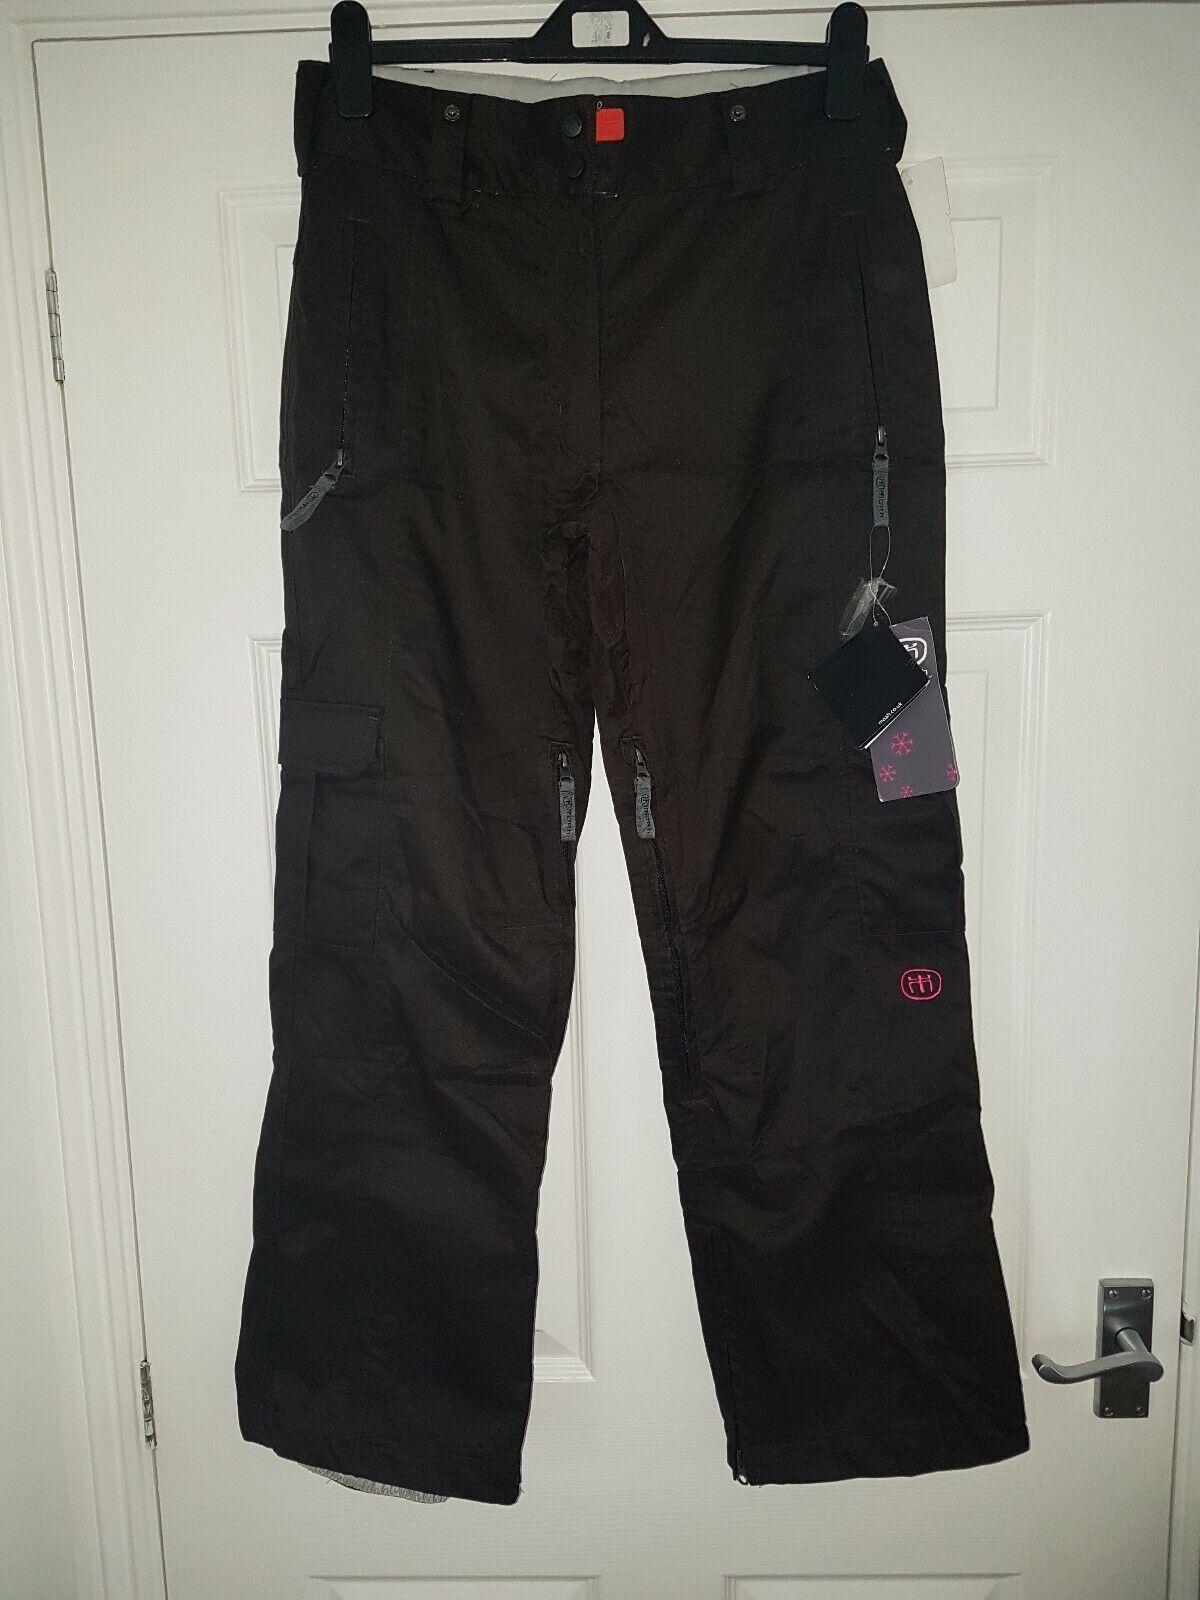 Moah Ski Snowboard Woman Girls Trousers  Size 10 Small RRP .00 BNWT NEW